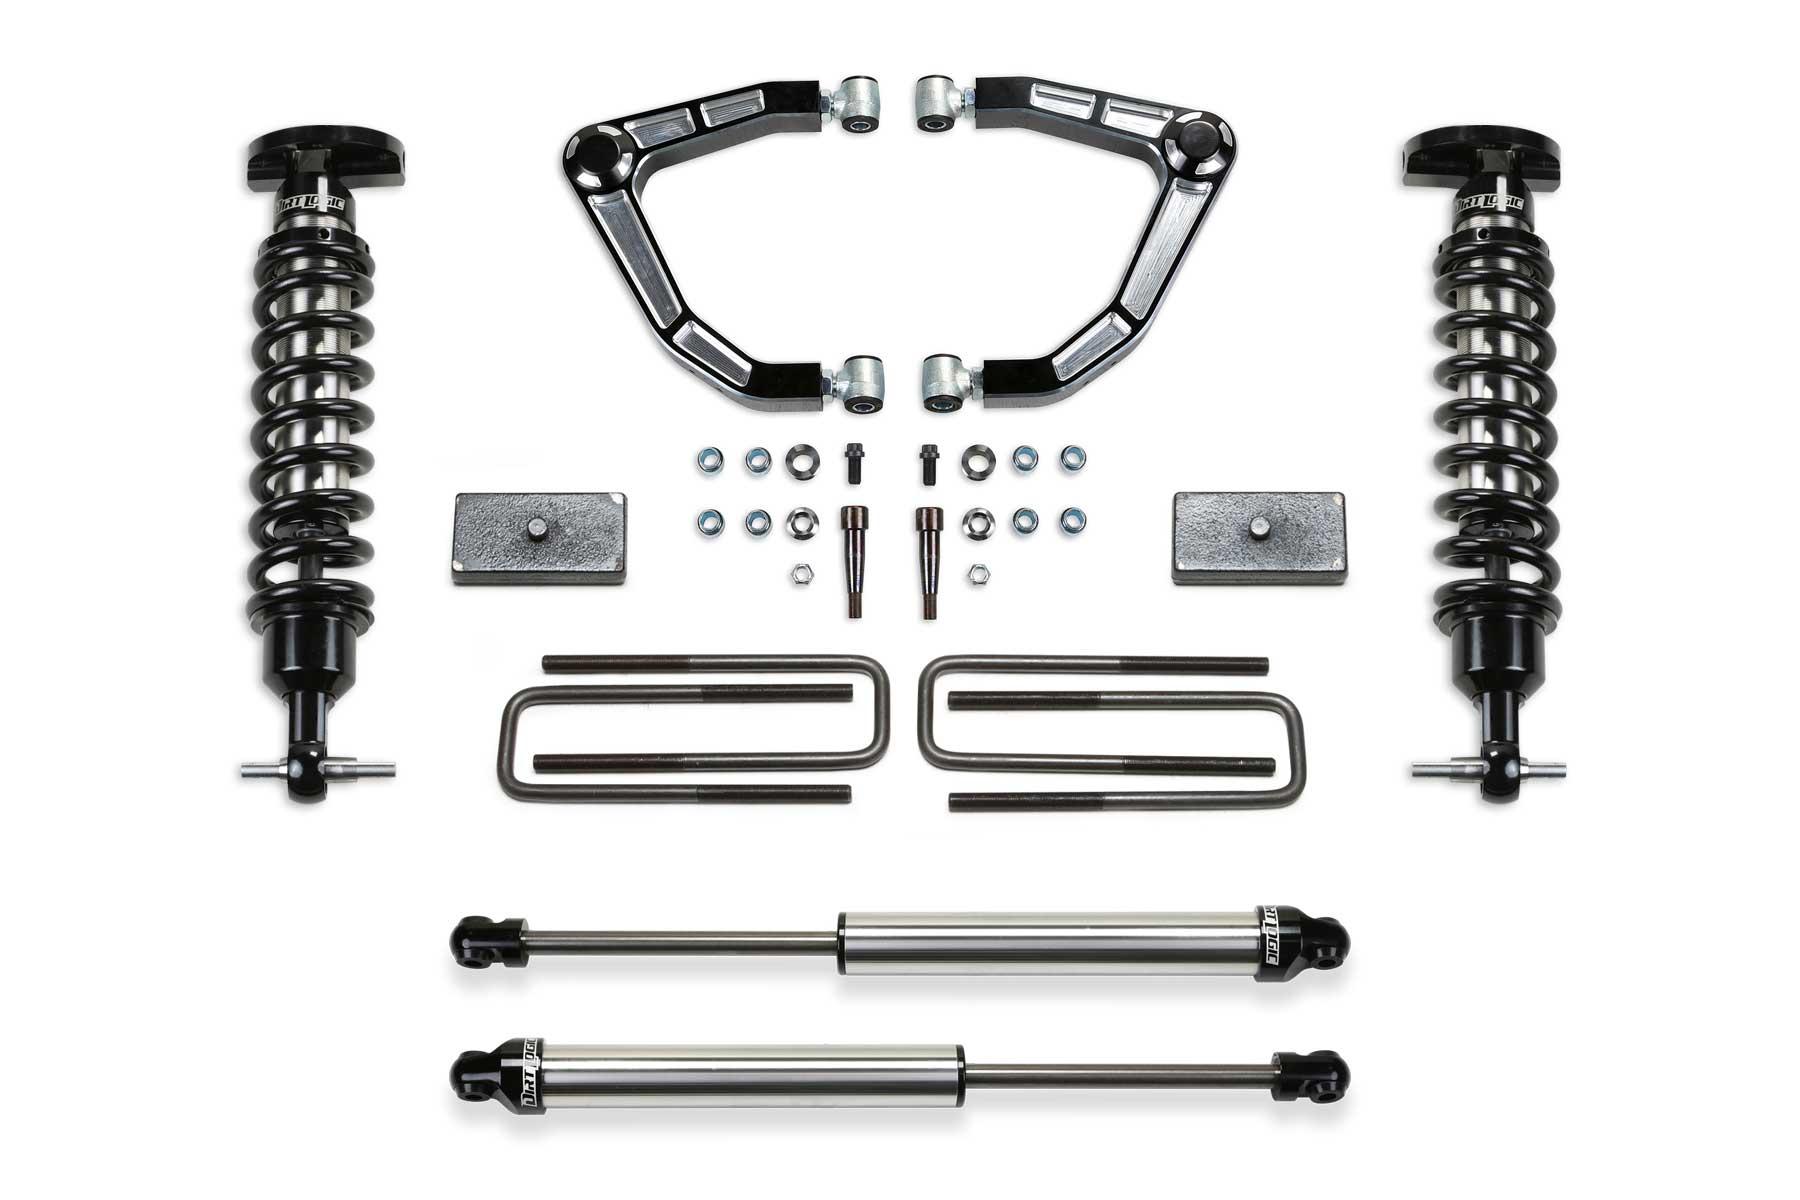 3 5 Aluminum Uniball Uca System W Bushing Rod Ends W